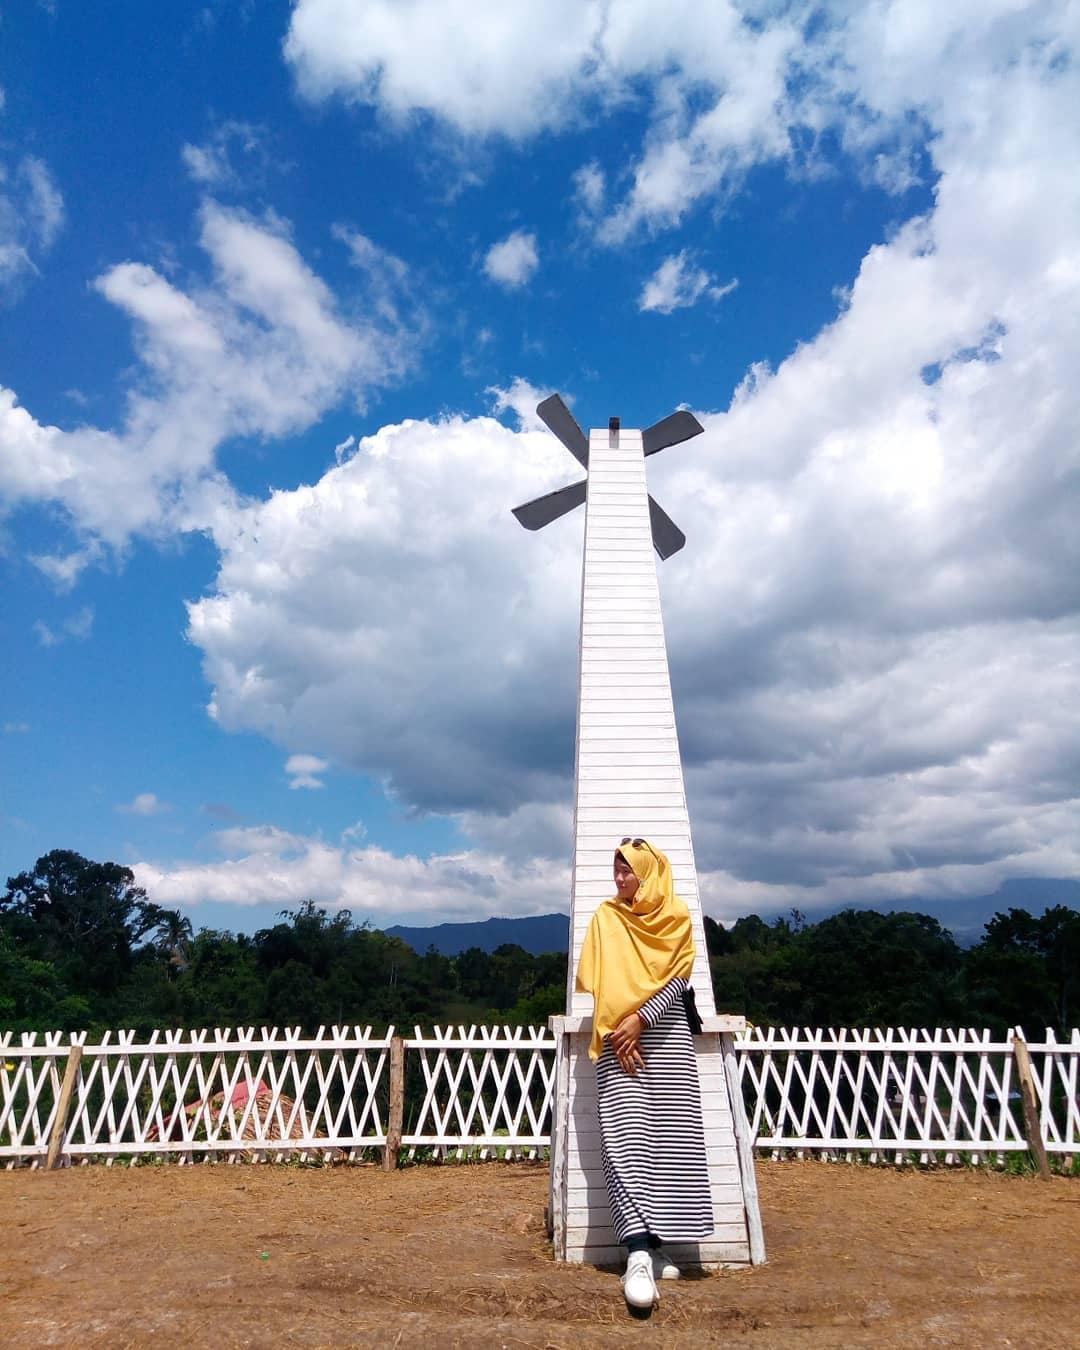 spot foto kincir angin di bukit kelinci payakumbuh